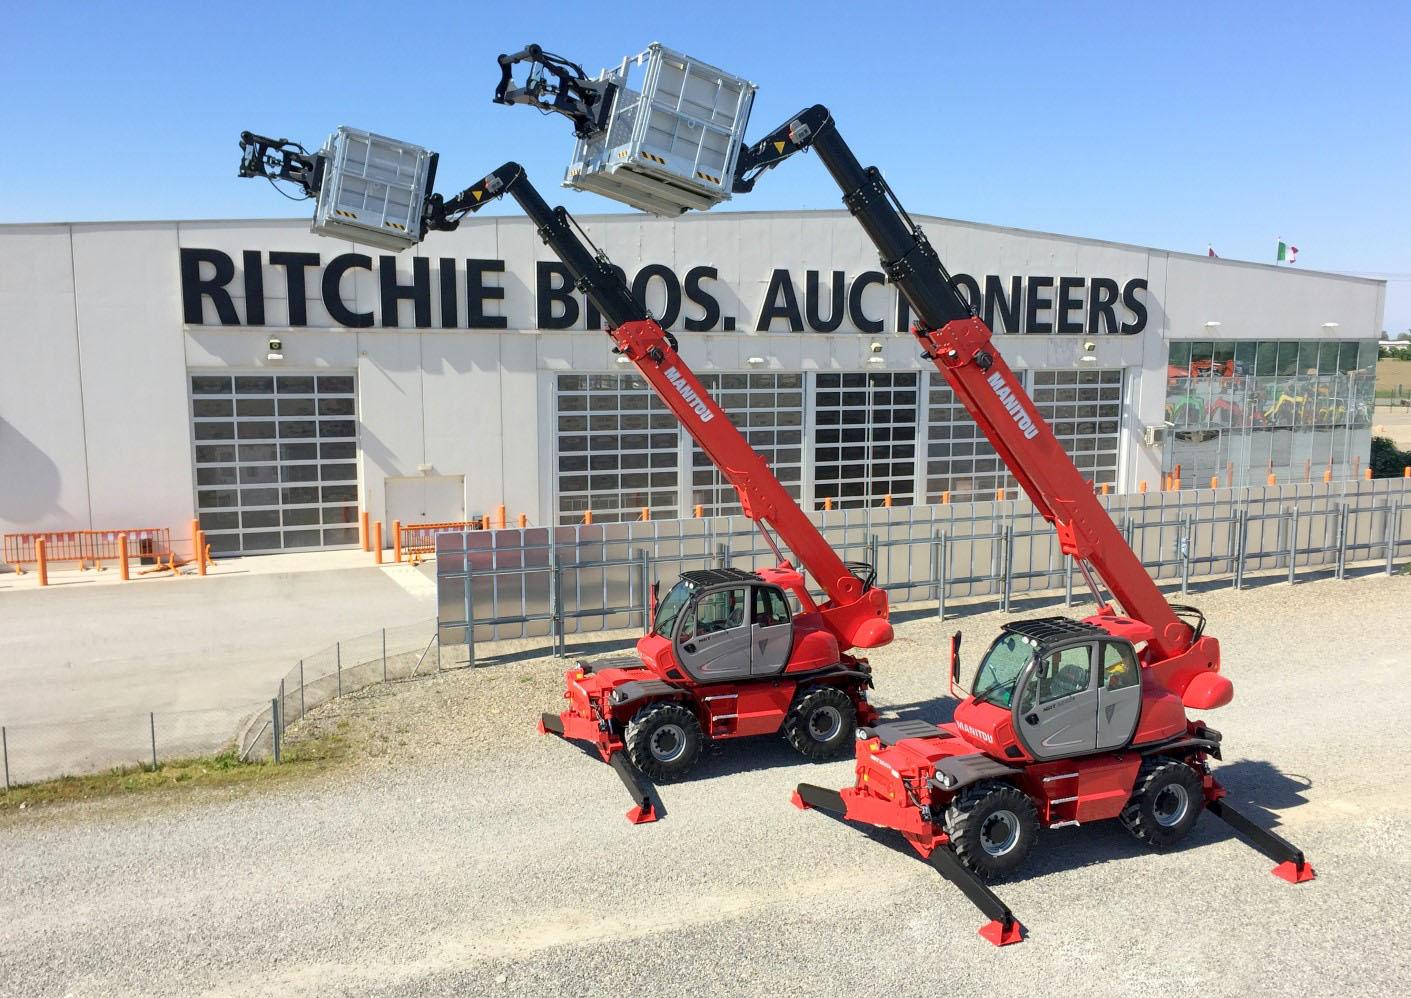 Ritchie Bros.: 123 aste nel 2017 -  -Notizie - MC5.0-Macchine Cantieri 1